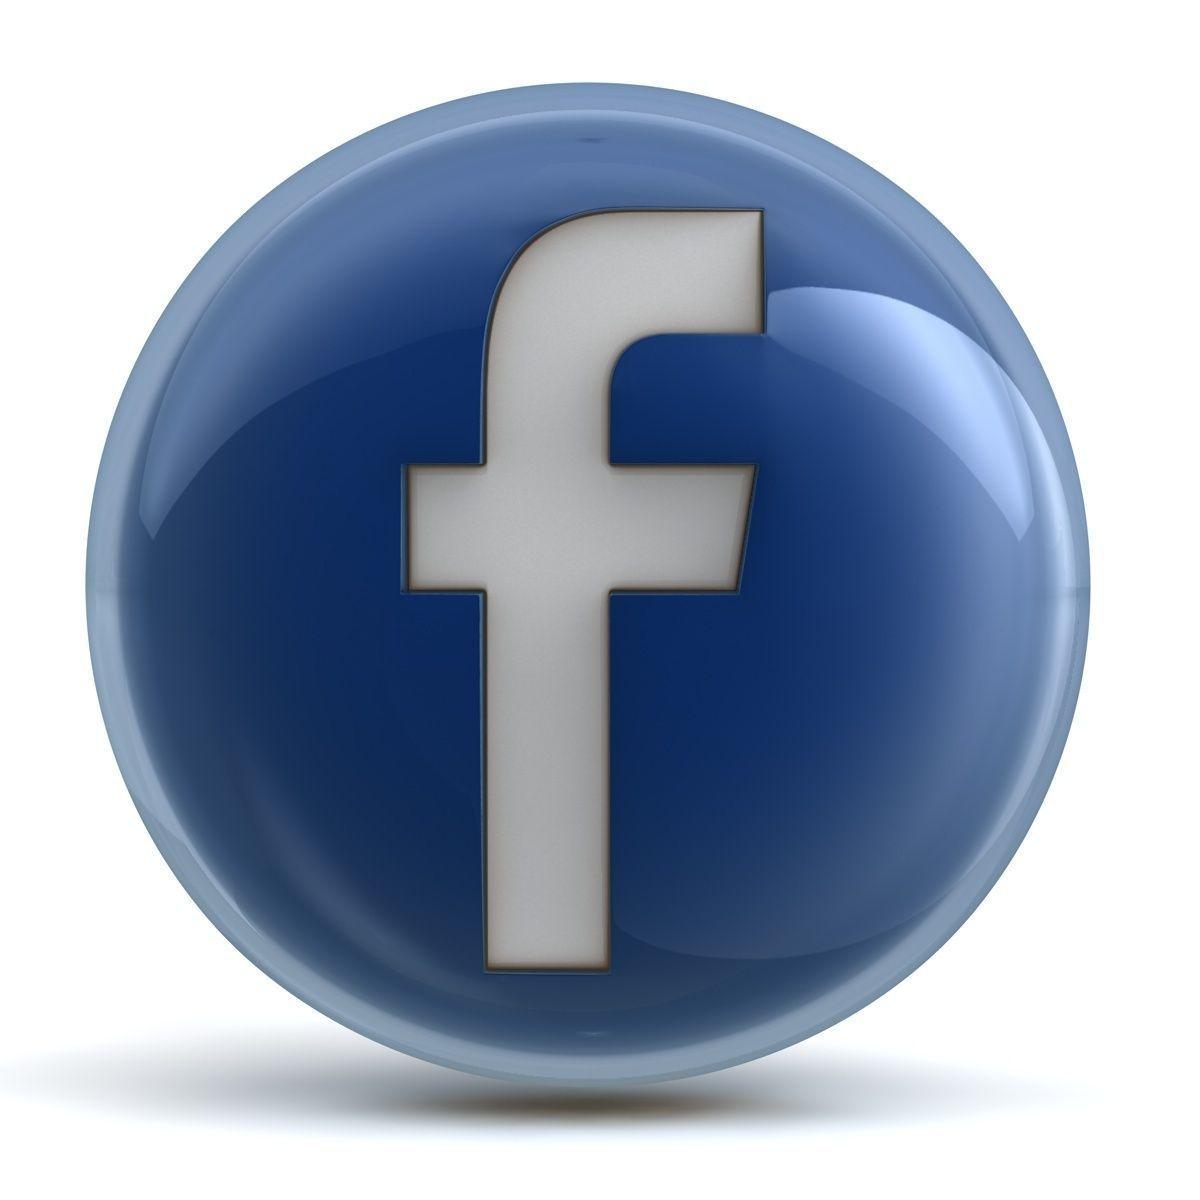 Low Sofa Facebook Icon 3d Model Obj 3ds Fbx C4d Cgtrader Com